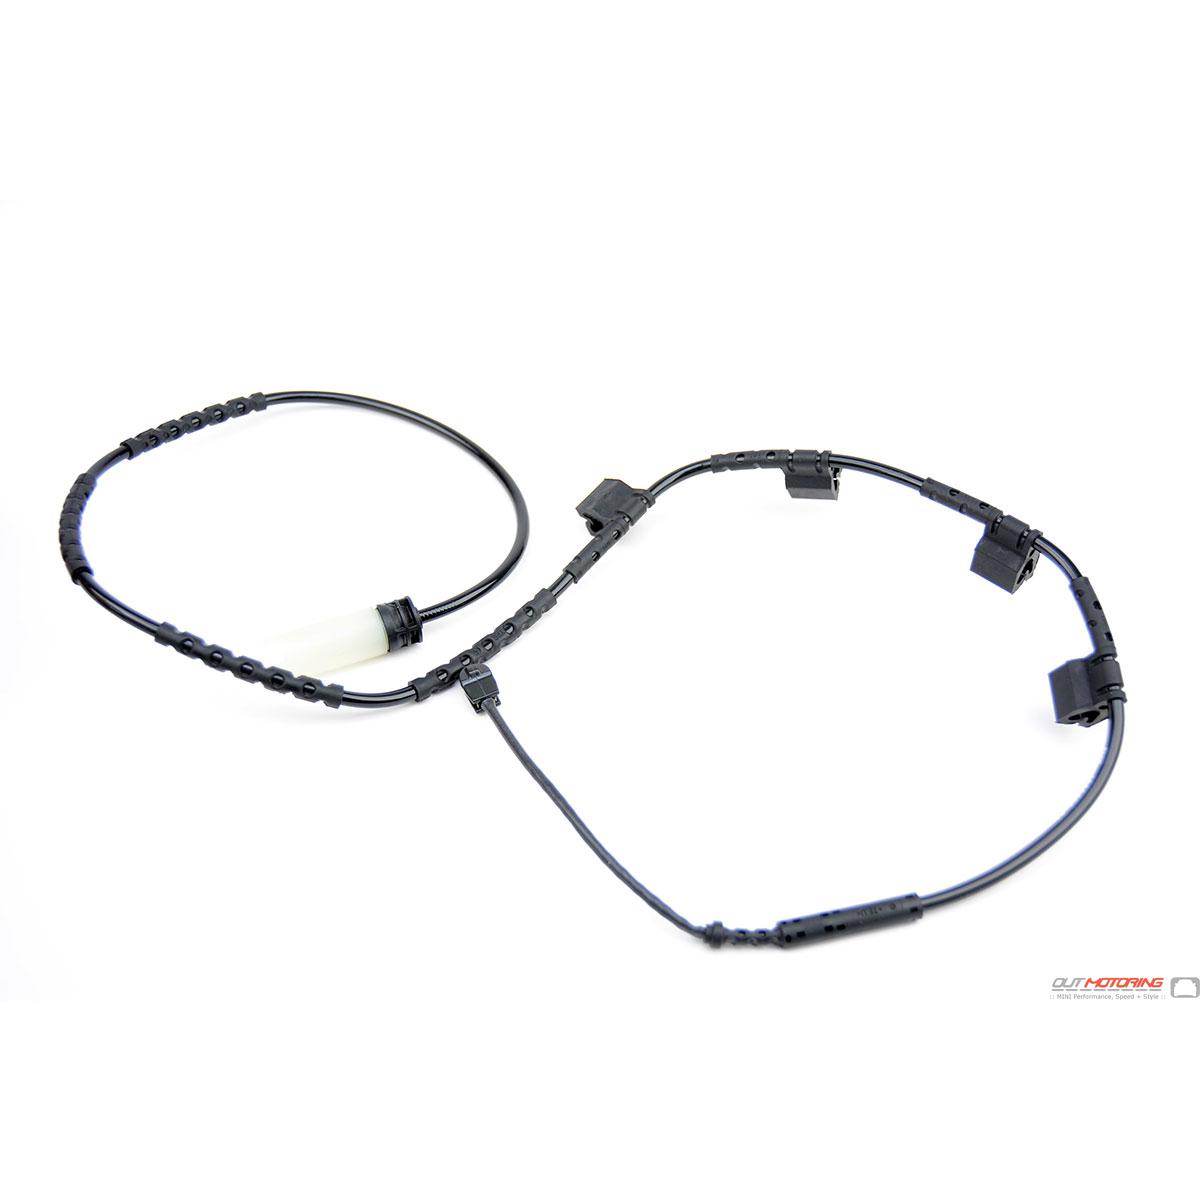 MINI Cooper 34356859135 Rear Caliper Brake Pad Wear Sensor